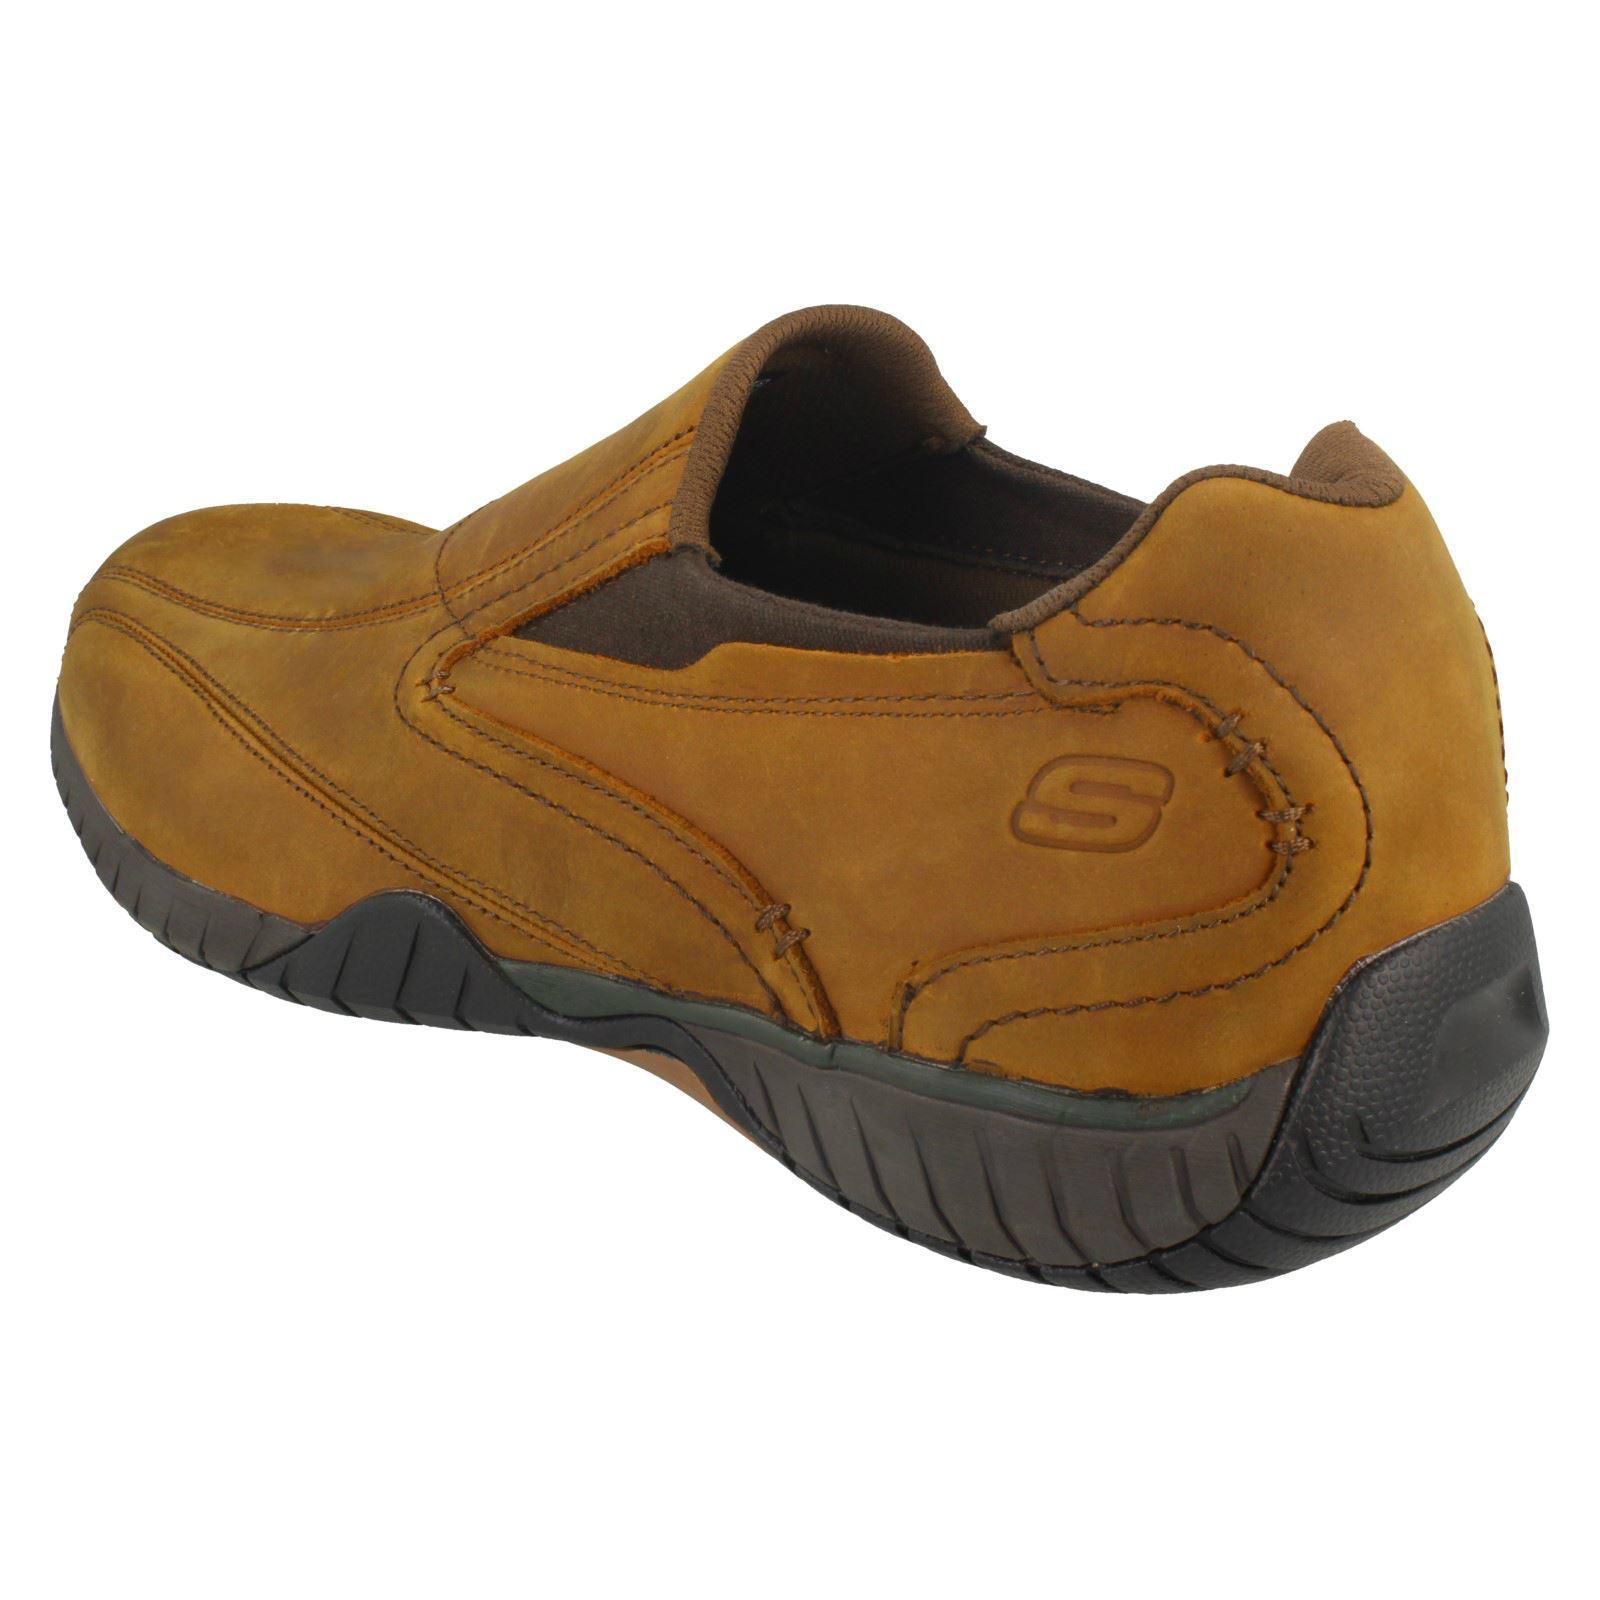 Trainers Herren Skechers Slip On Casual Schuhes / Trainers  Style Bascom  N fbbc0e